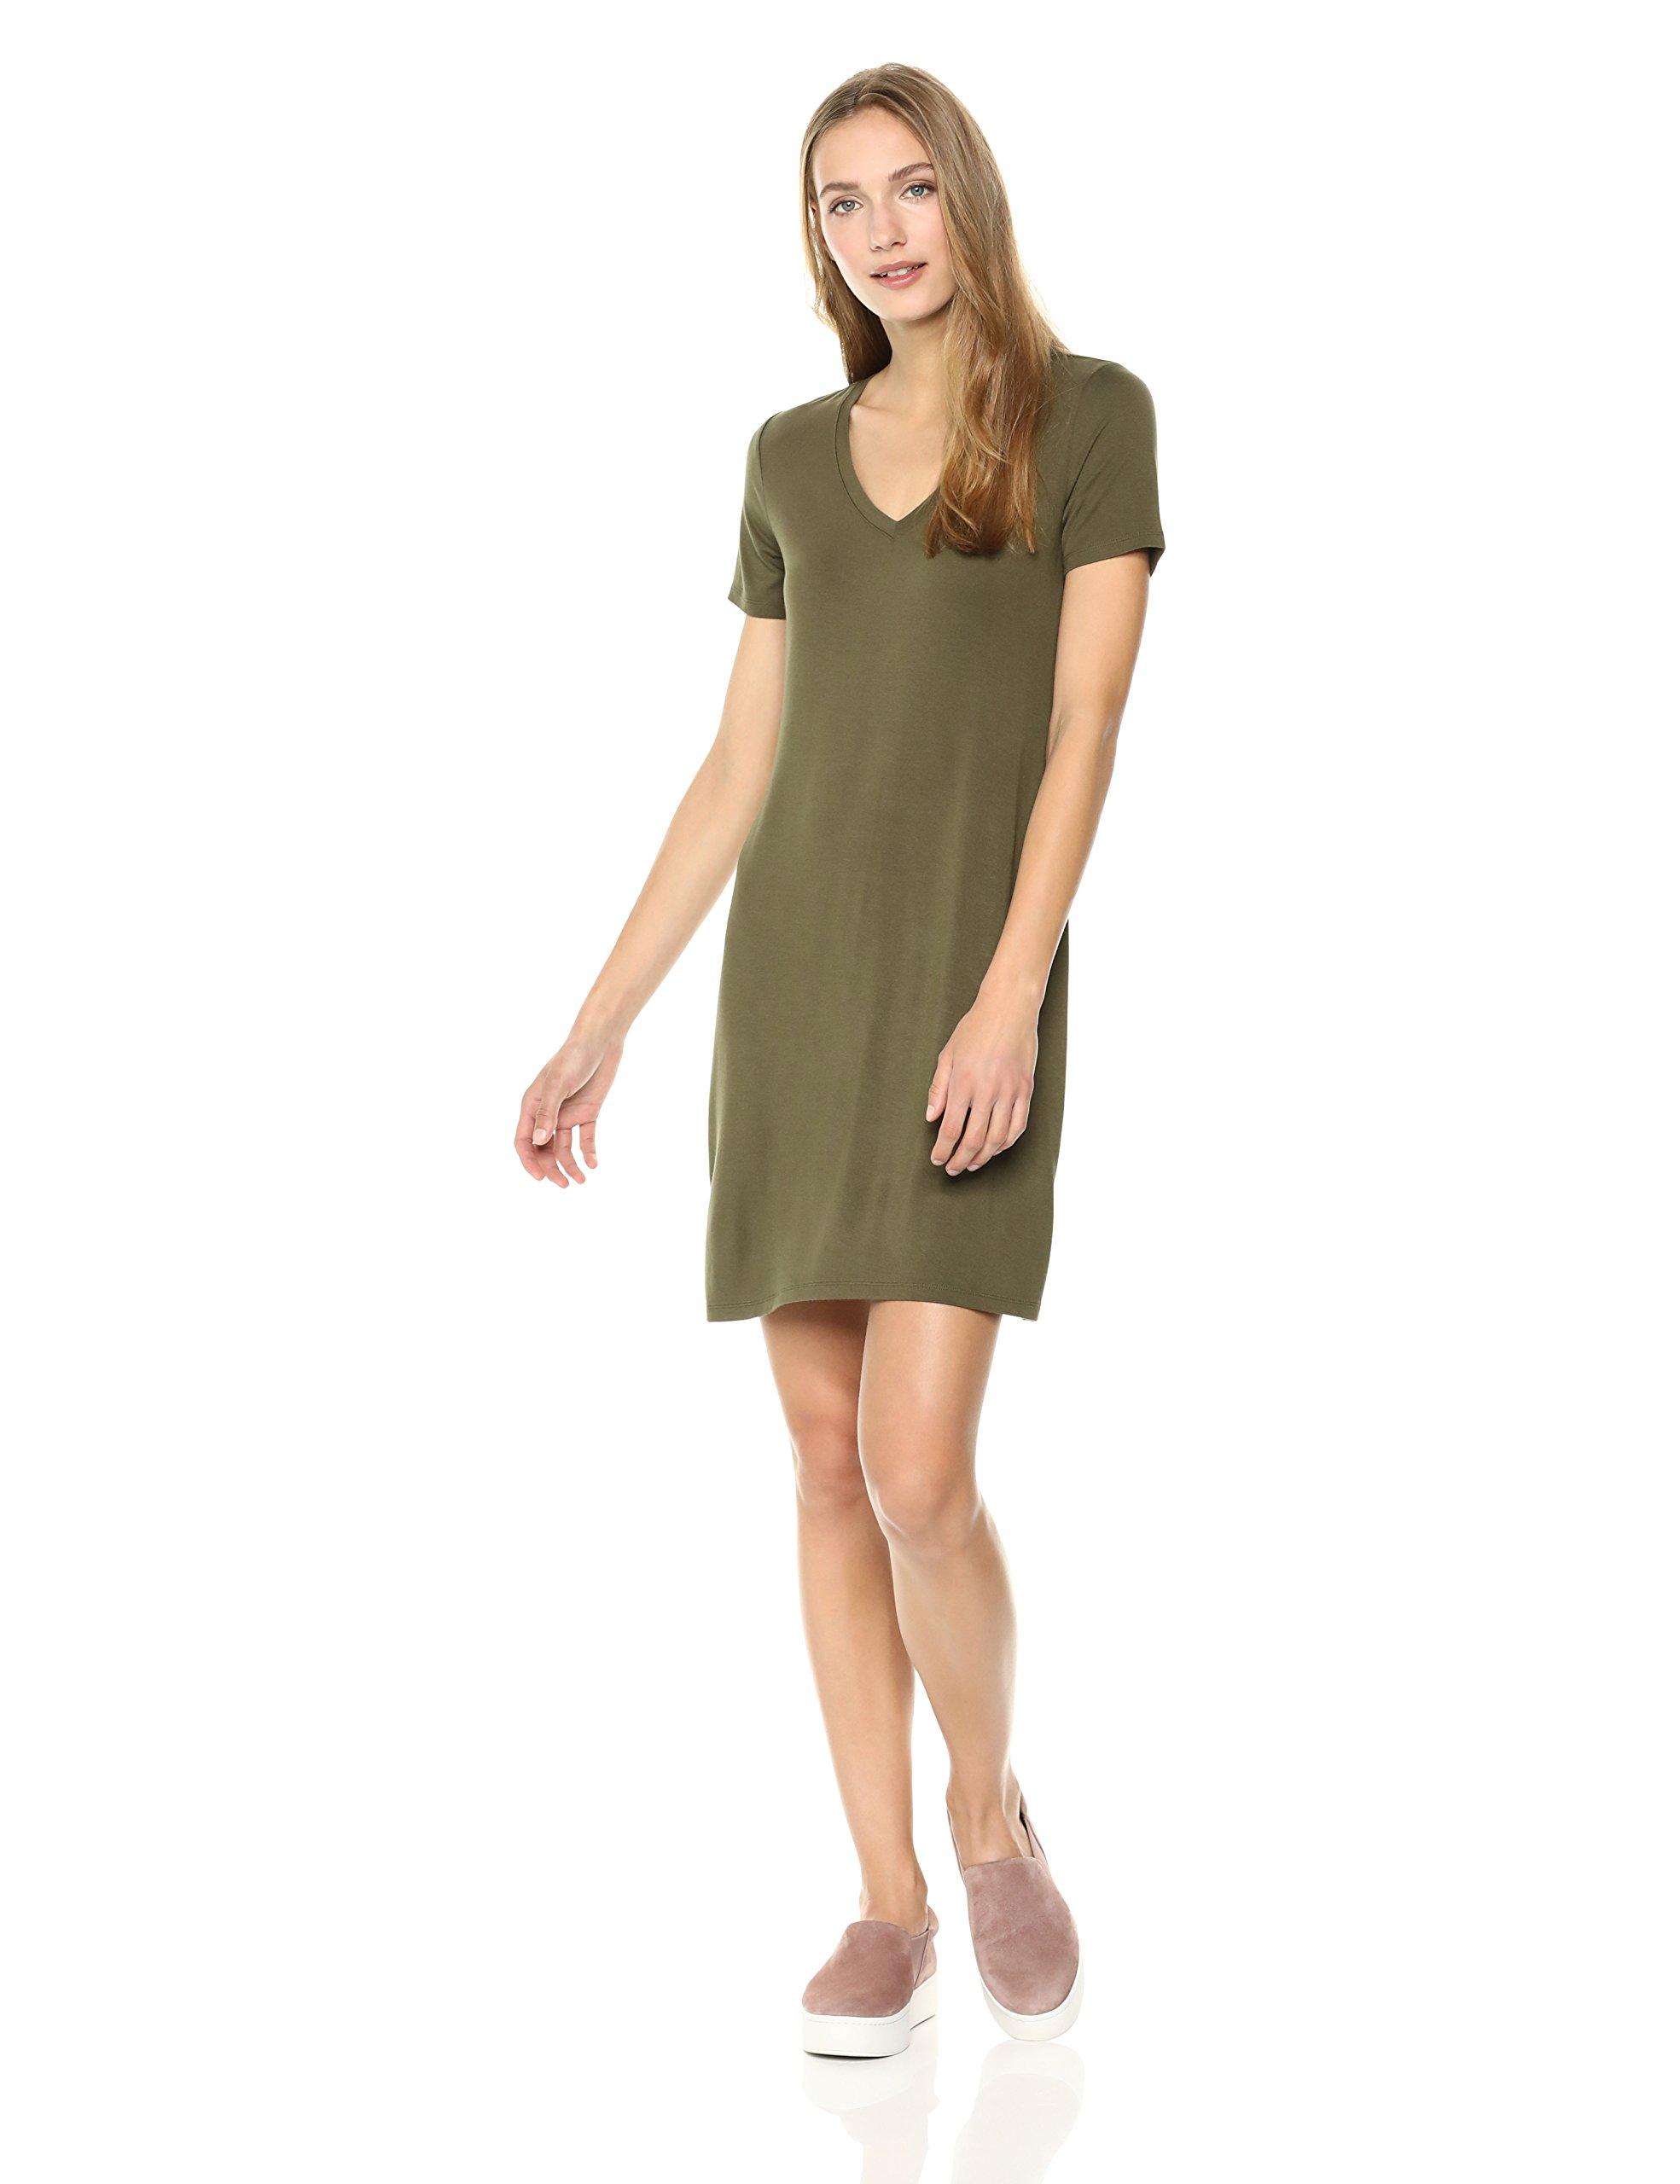 Daily Ritual Women's Jersey Short-Sleeve V-Neck T-Shirt Dress, Olive Green, S